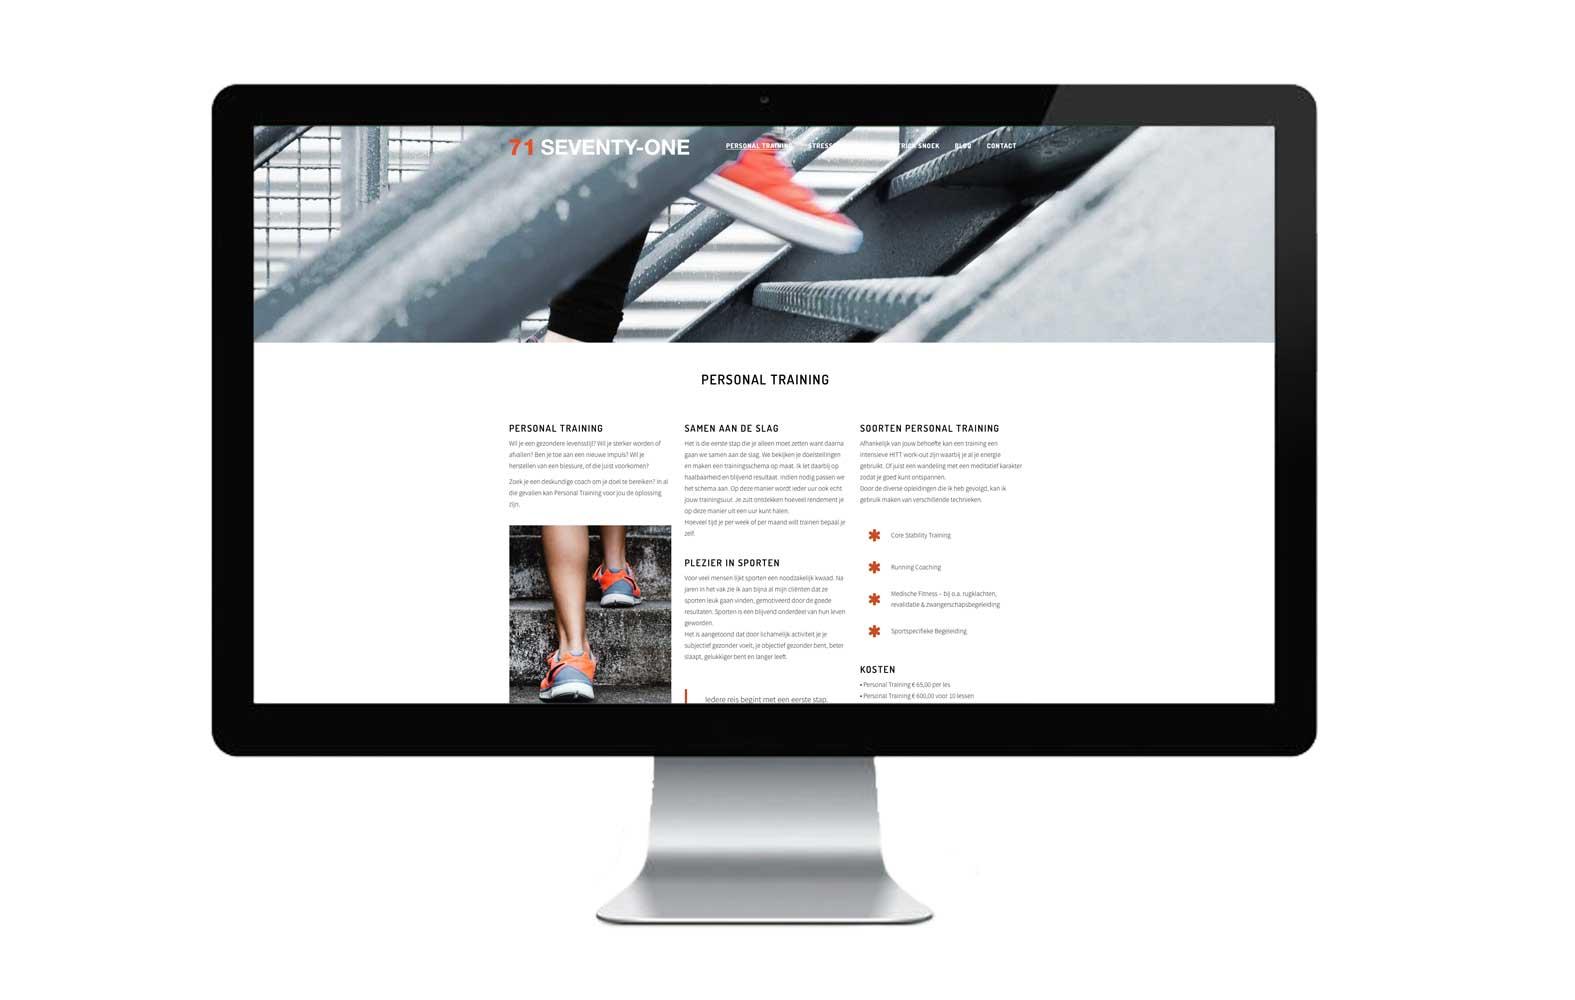 StudioErnst-WebDesign-SeventyOne2